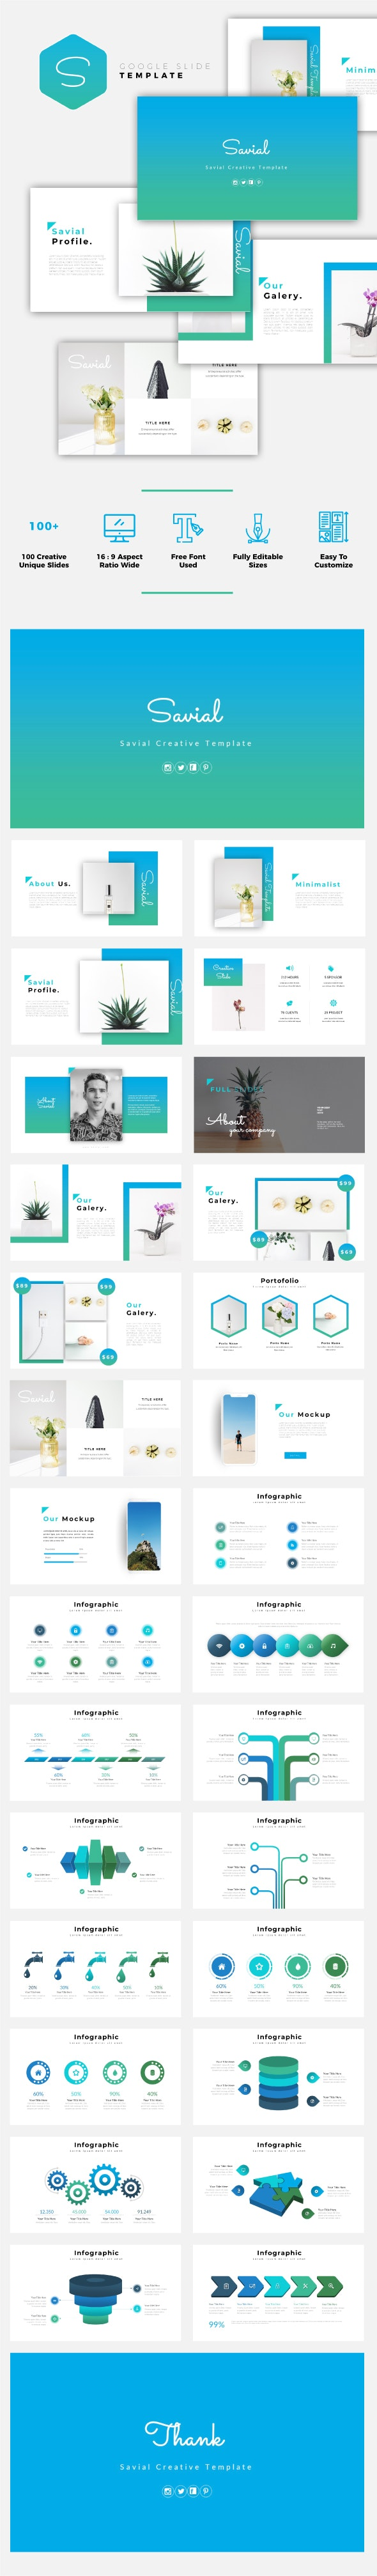 Savial - Creative Google Slides Template - Google Slides Presentation Templates